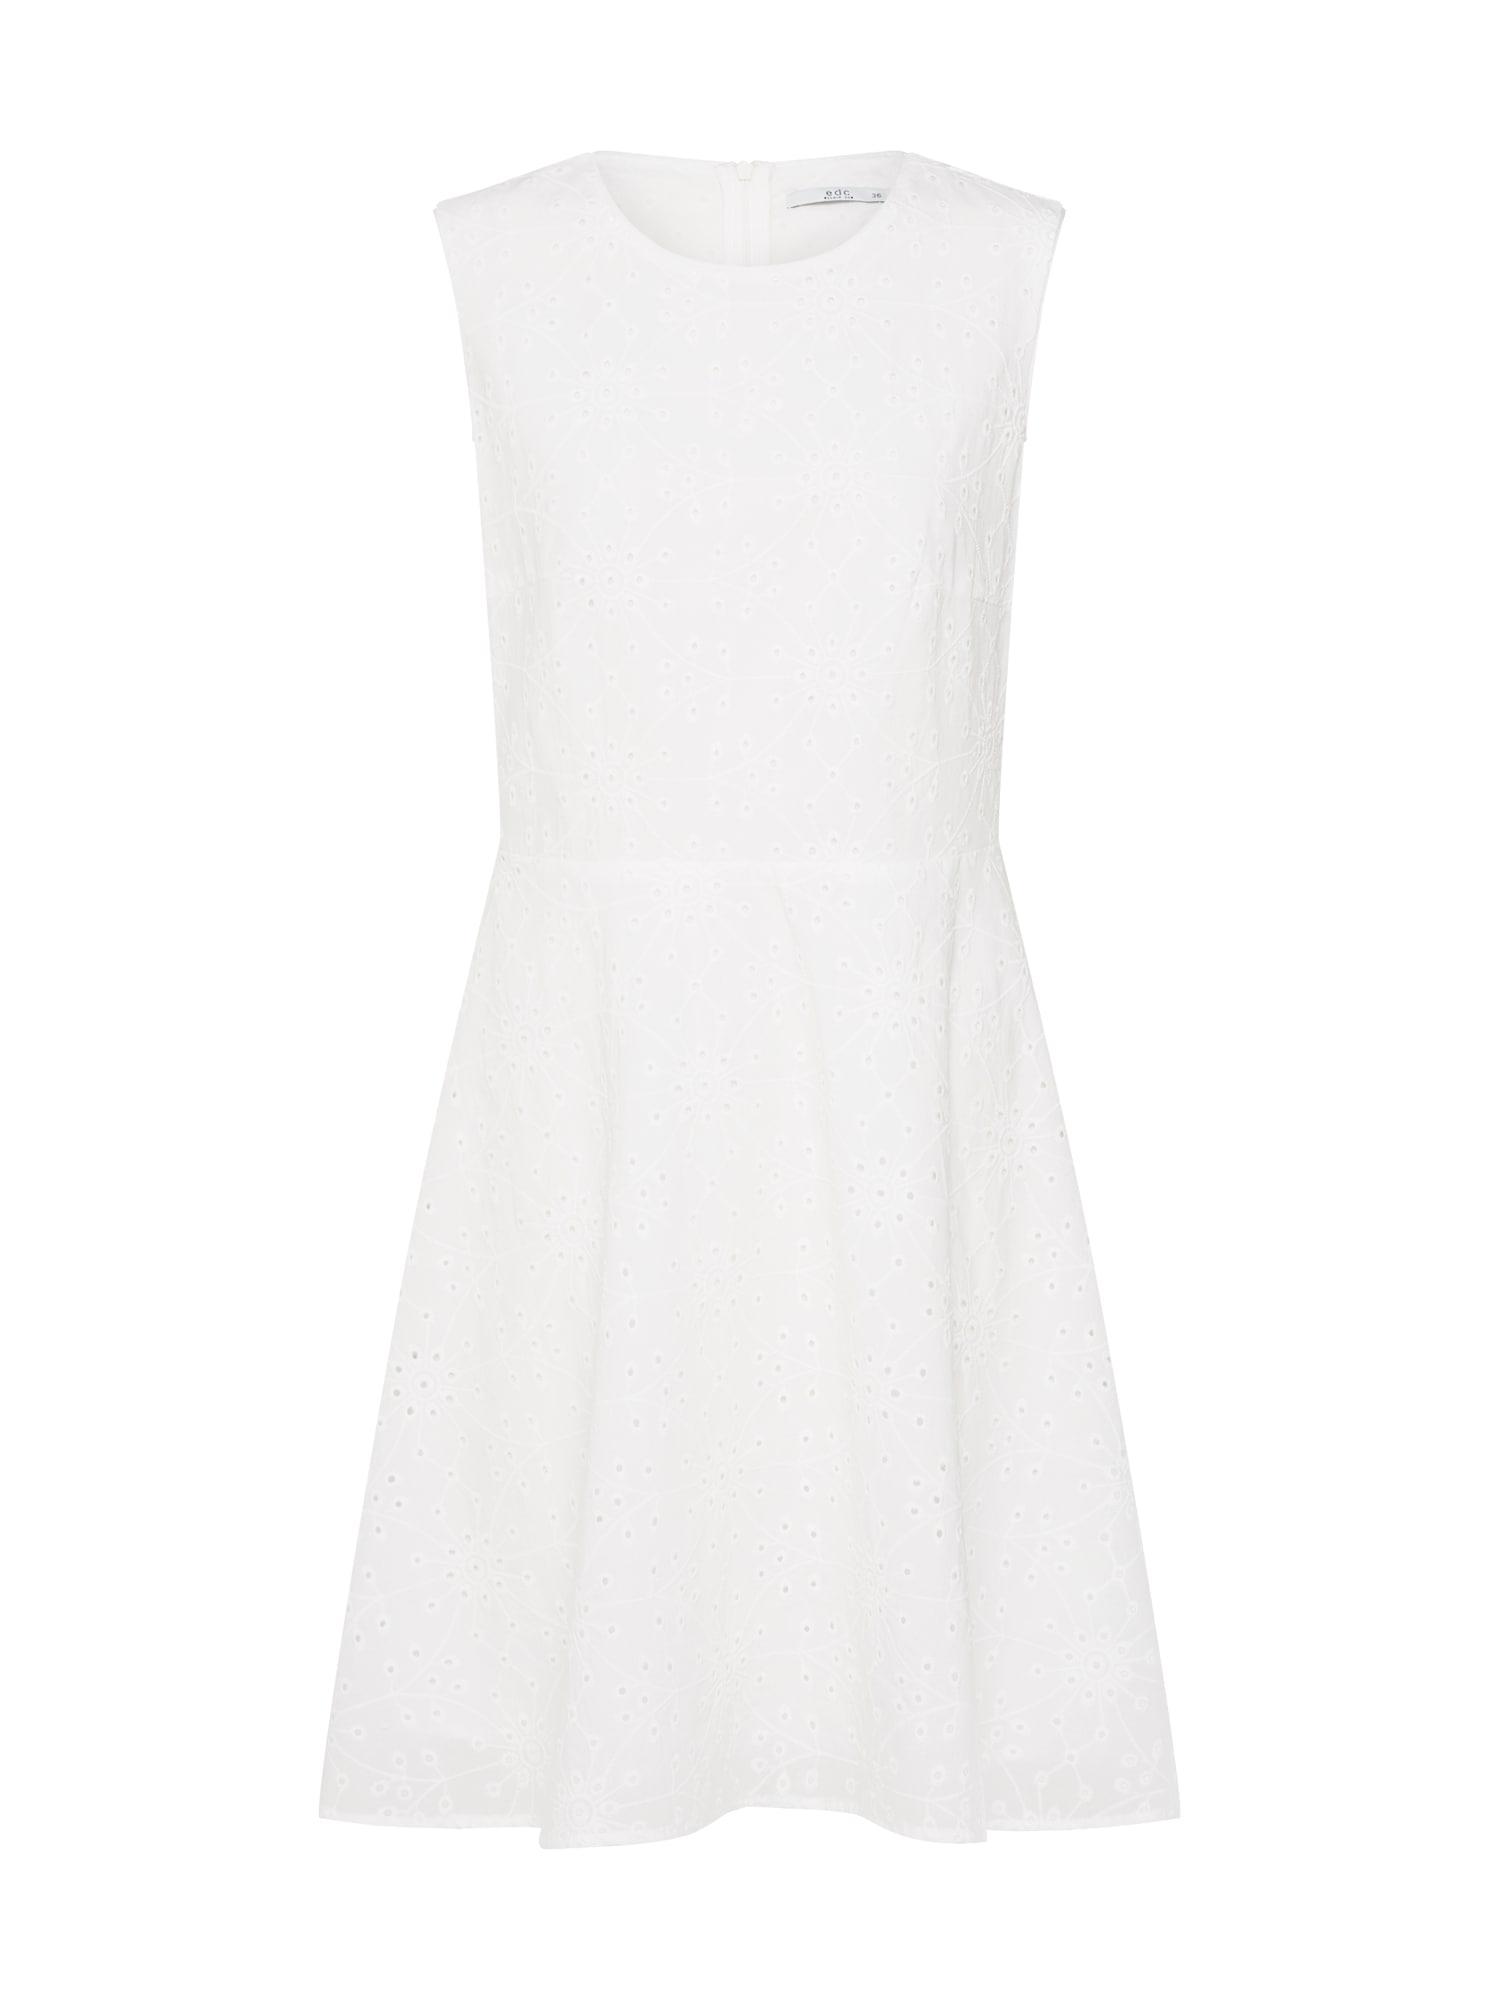 Pouzdrové šaty FLOW offwhite EDC BY ESPRIT